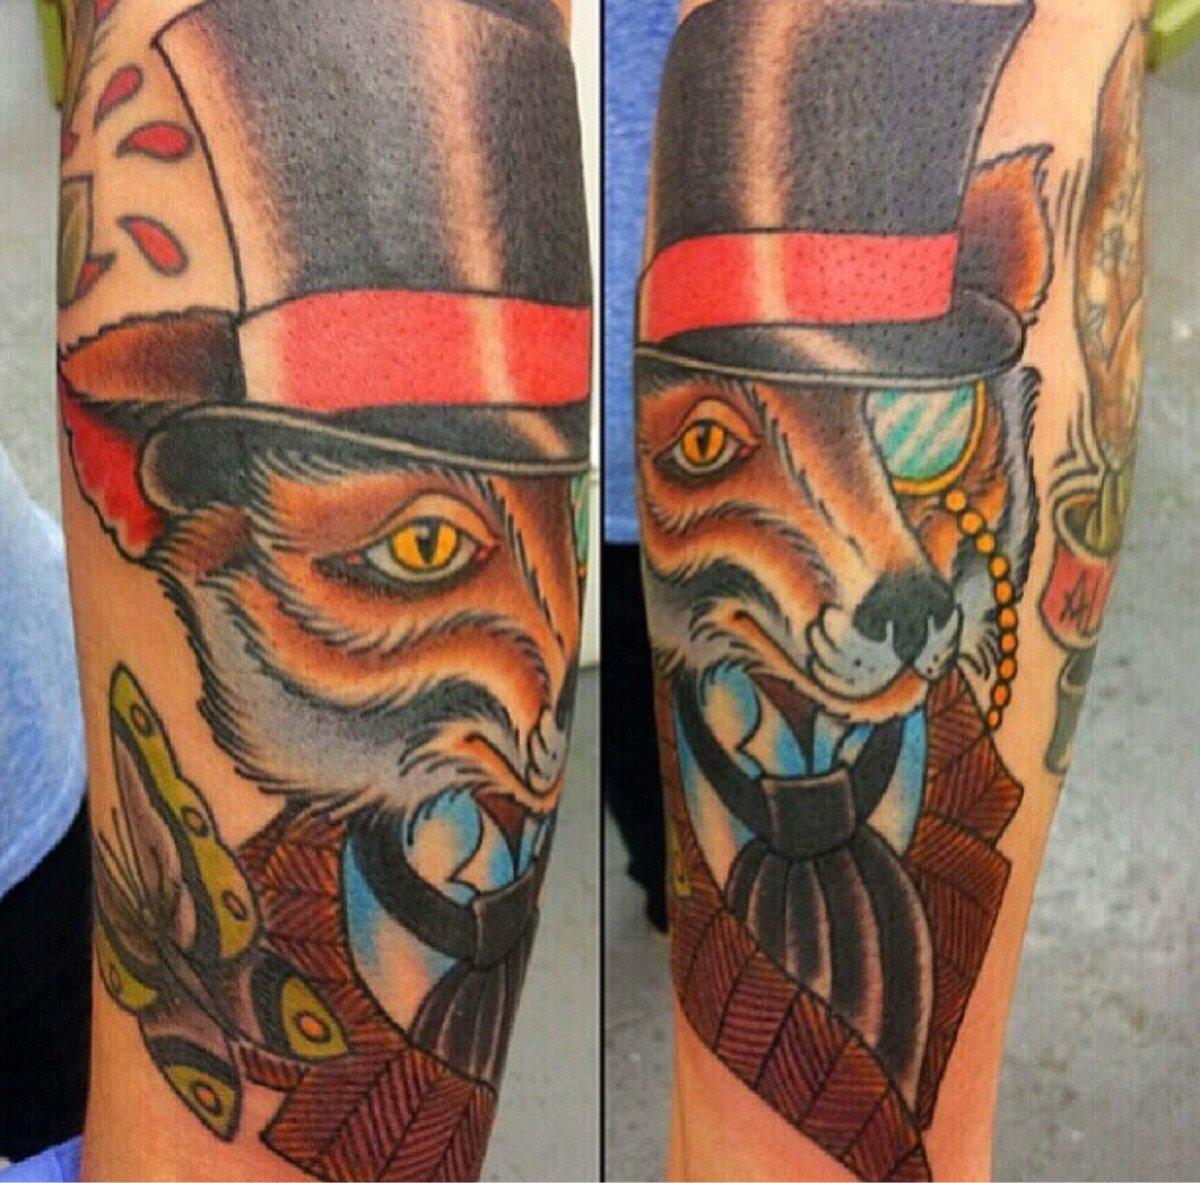 &quot;Dapper Fox by #Kelly #Edwards at Element in SATX&quot; #tattoos #ink #pics<br>http://pic.twitter.com/K3UXGBIwVS